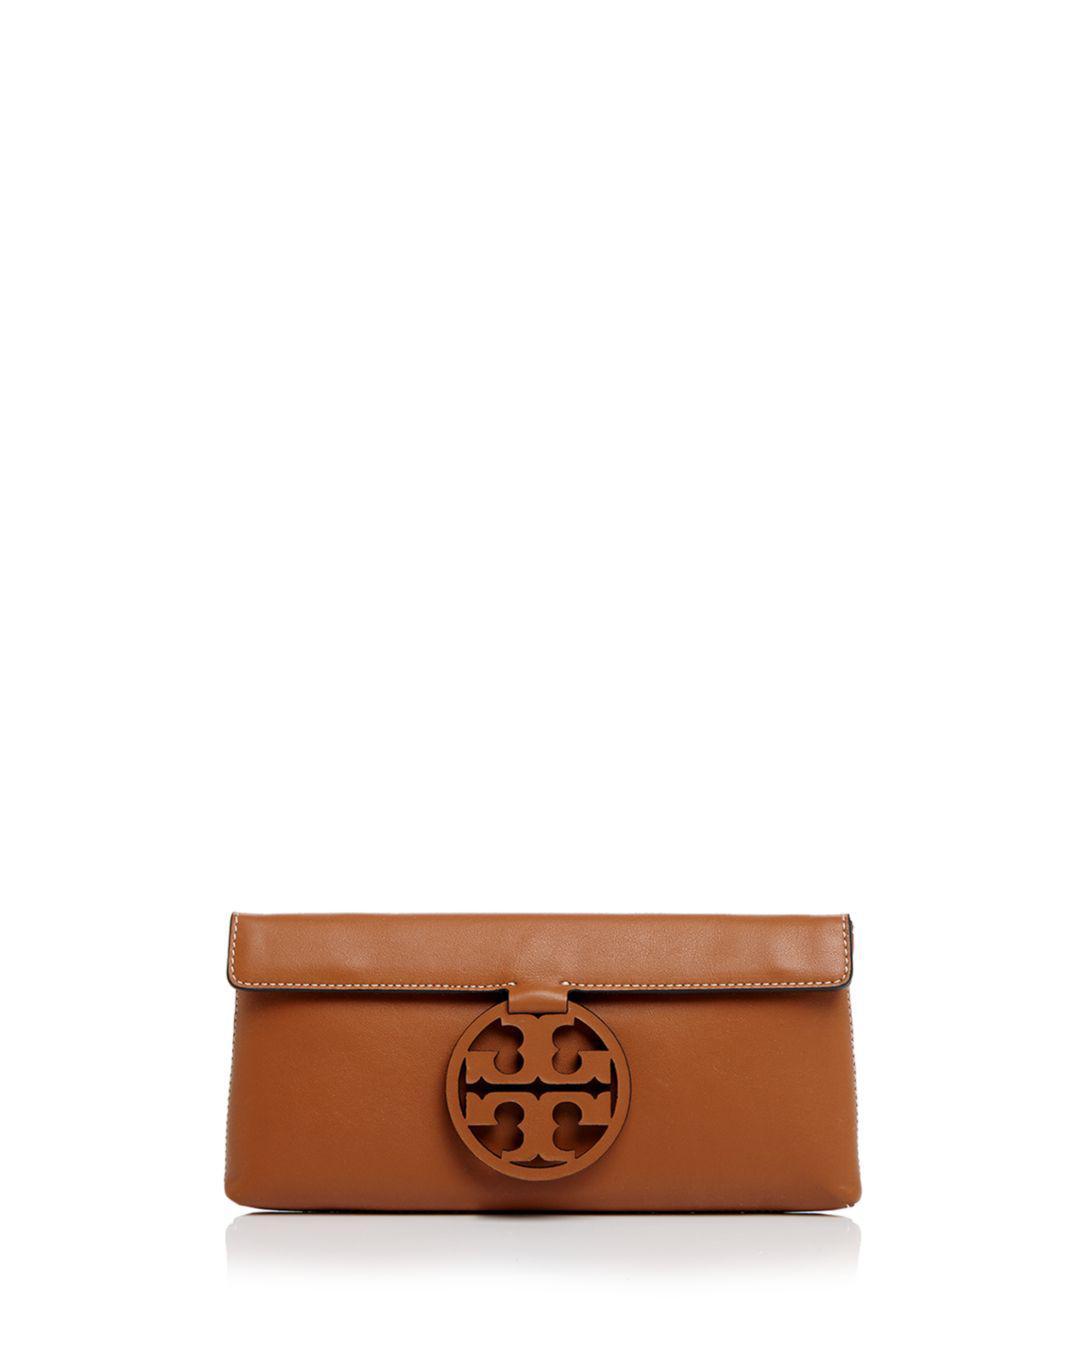 b2c2fede6988 Lyst - Tory Burch Miller Leather Clutch in Brown